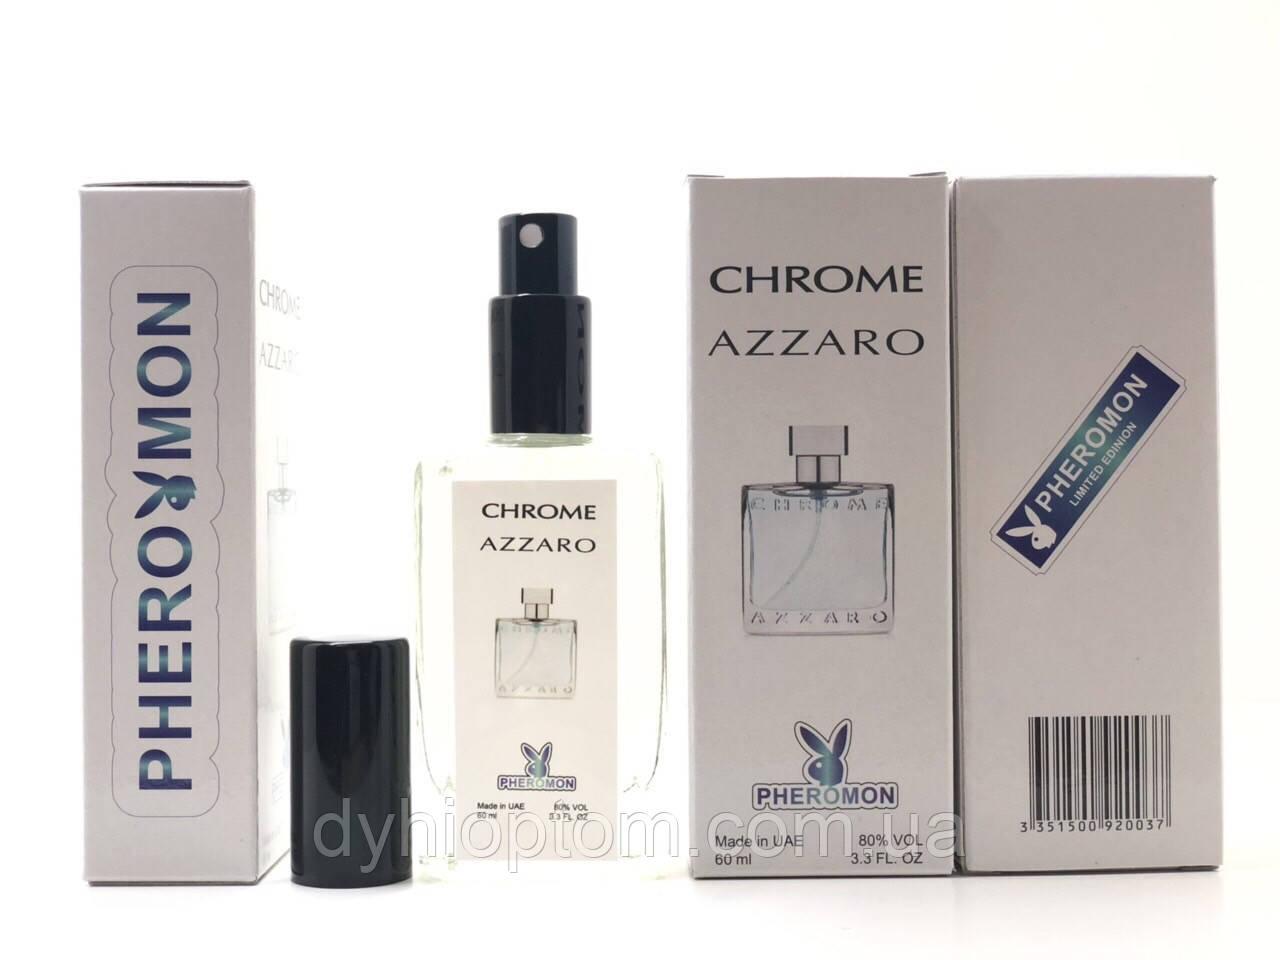 Мужской парфюм Azzaro Chrome, 60 ml